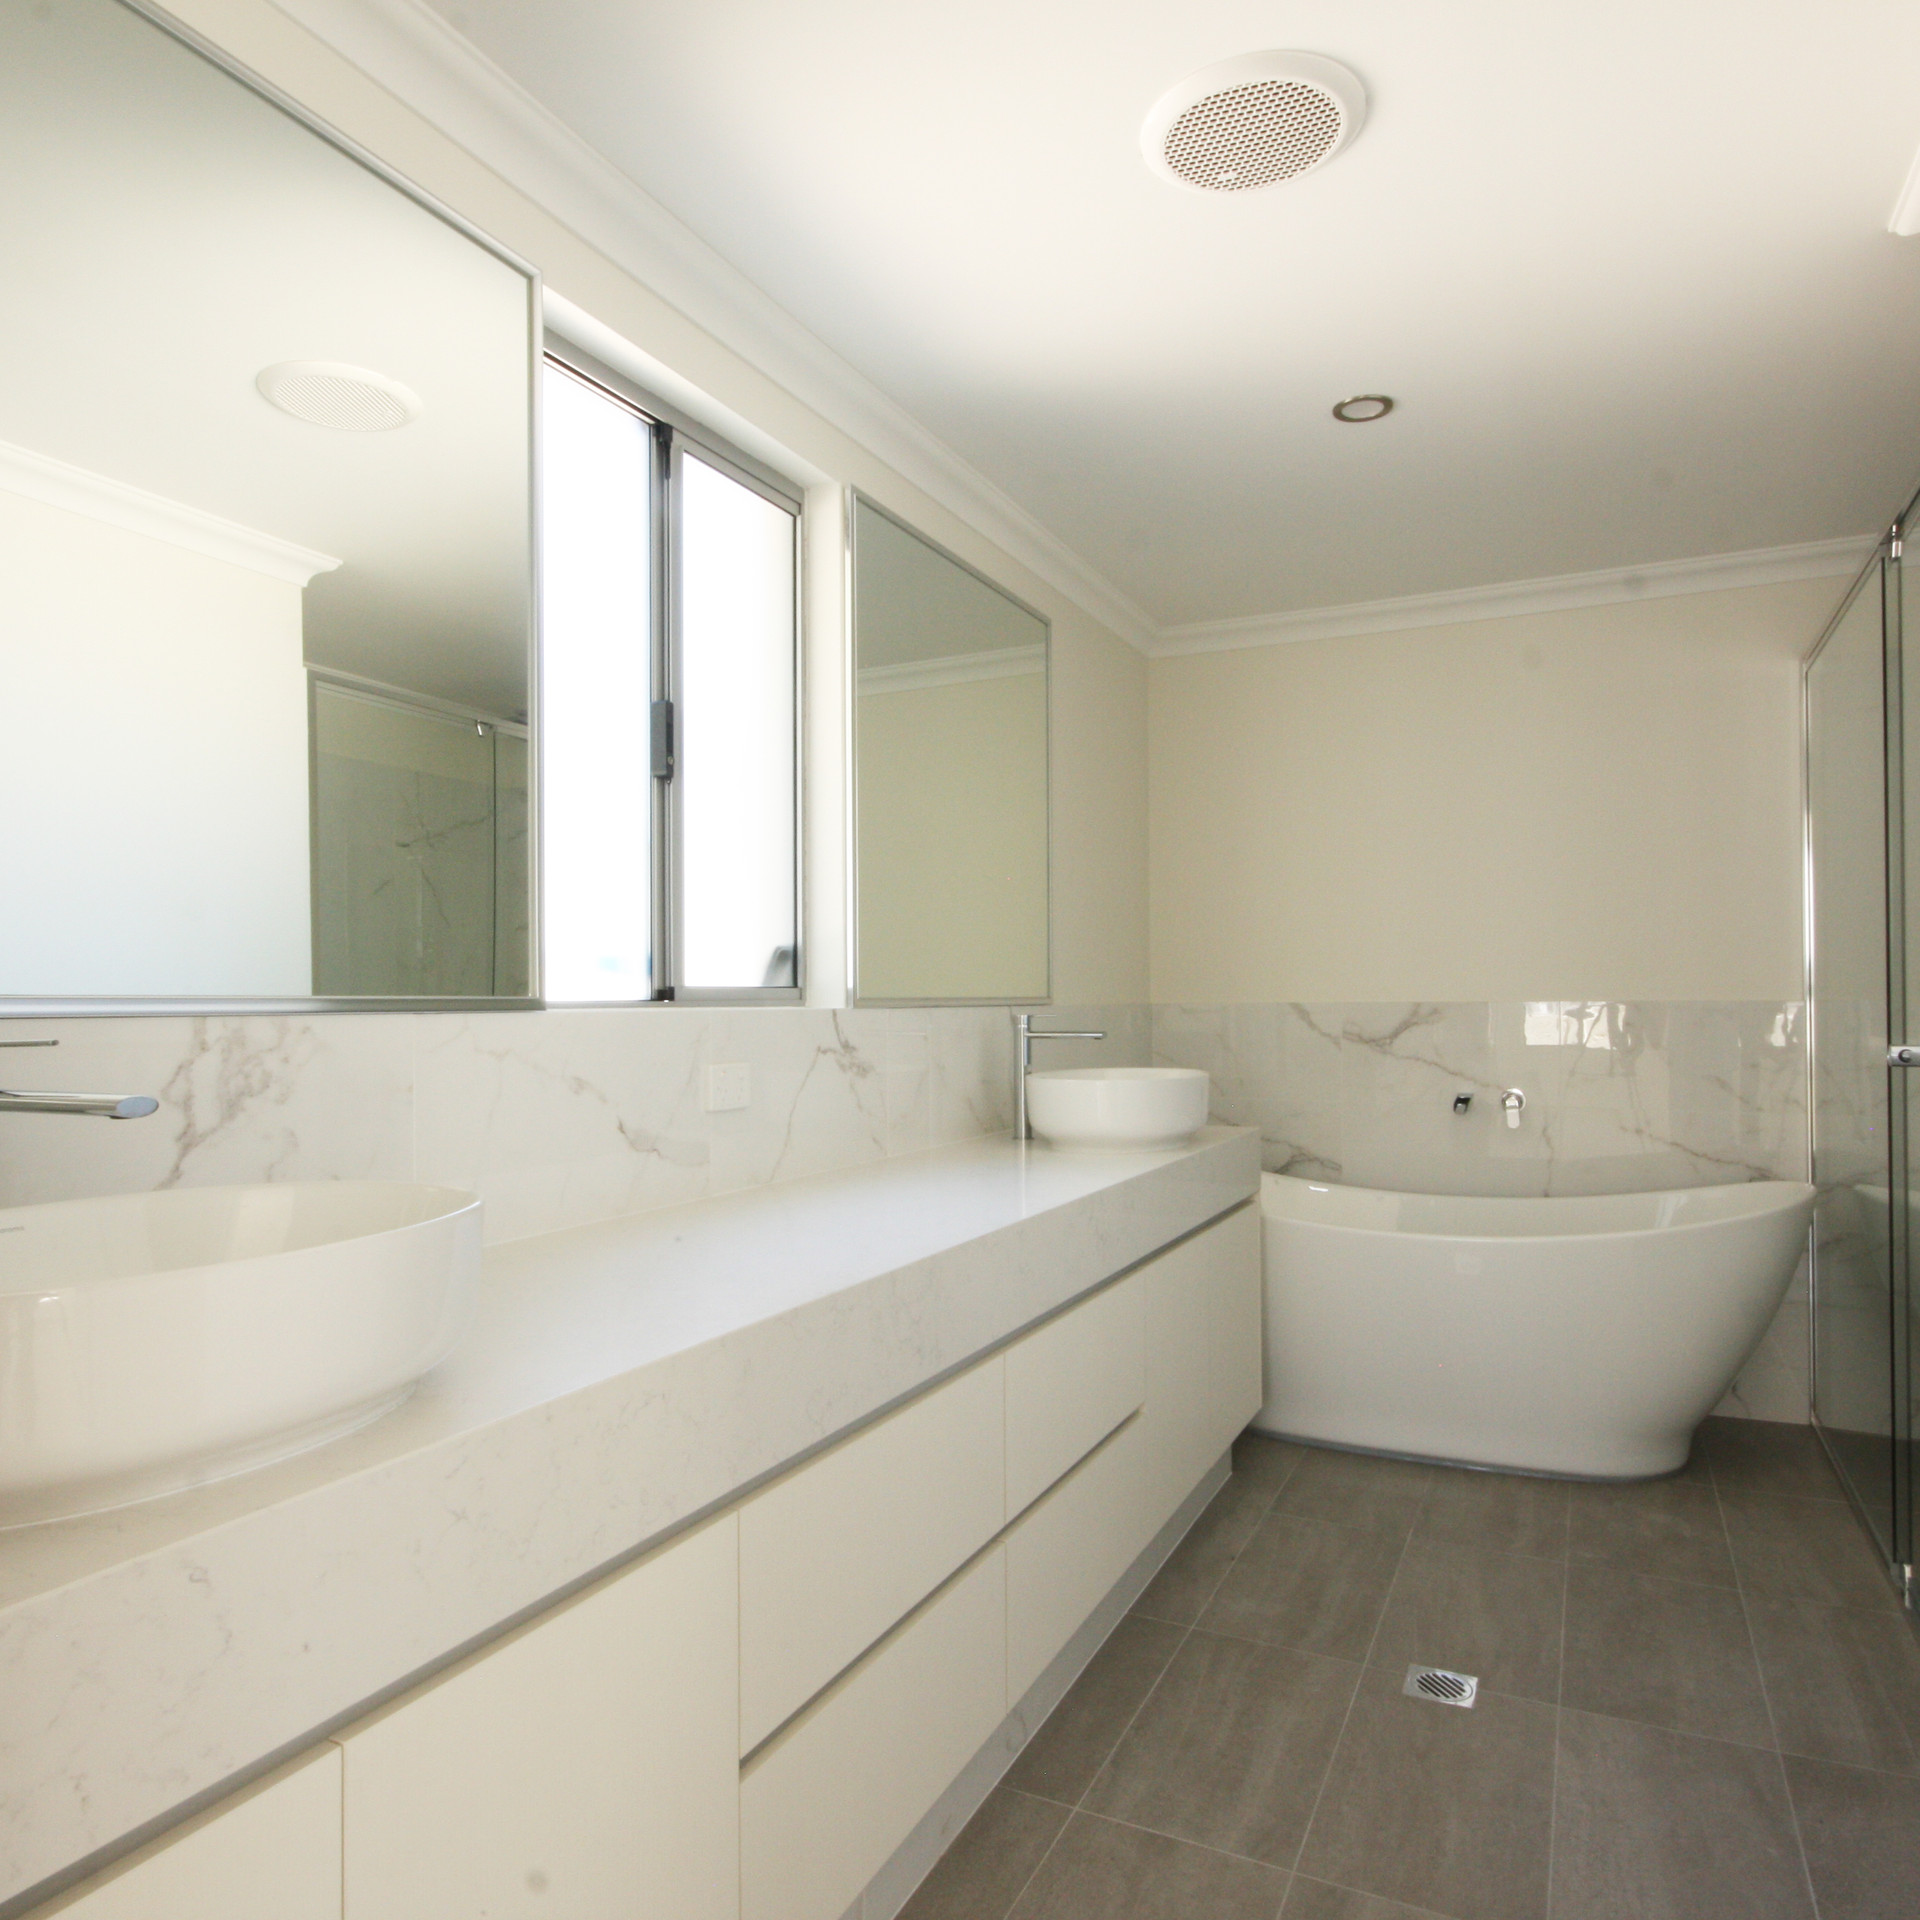 Modern White Bathroom Vanity East Victoria Park, Perth